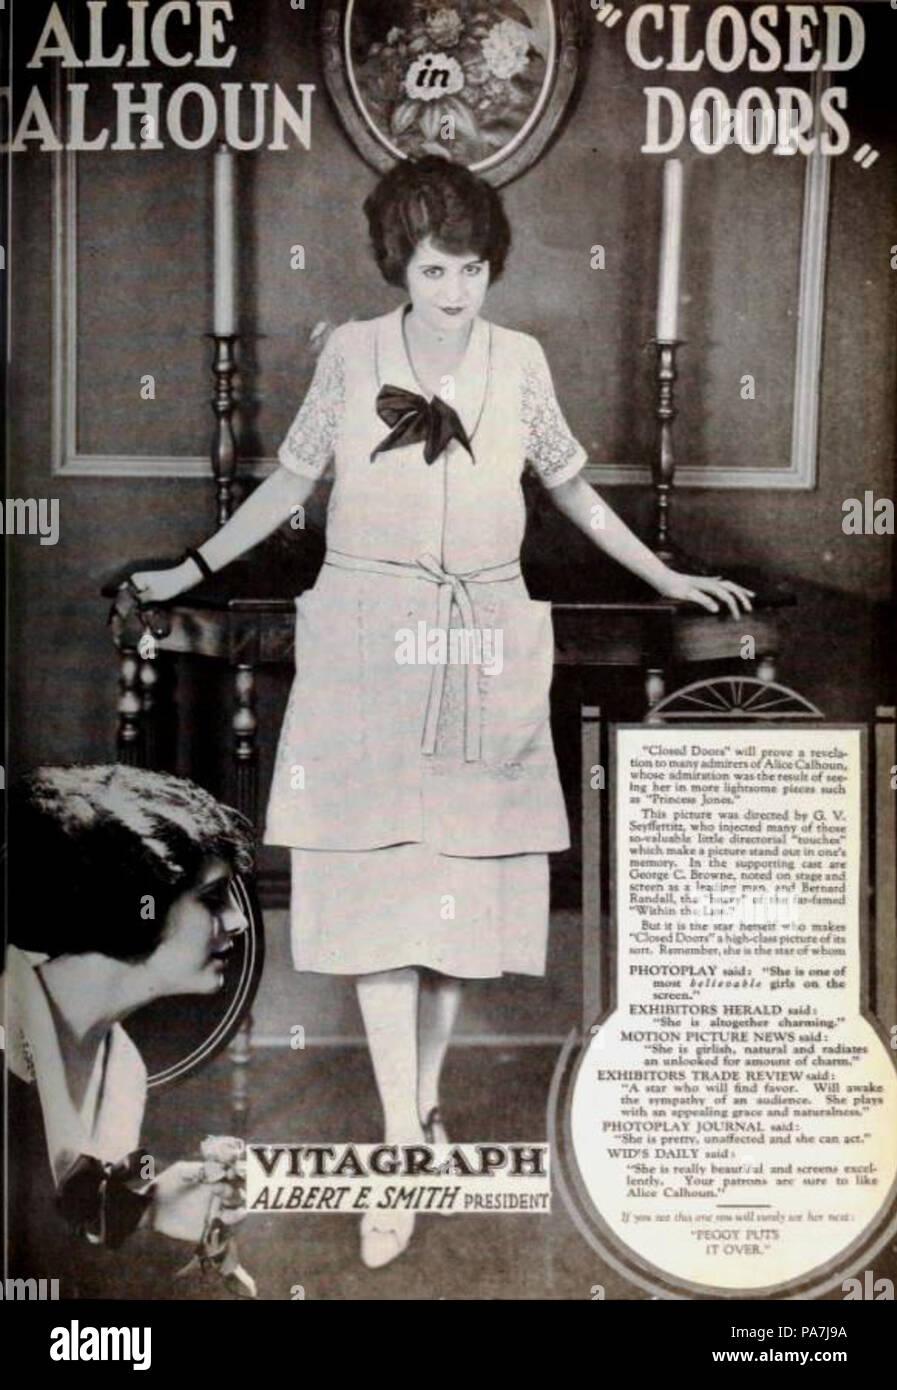 325 Closed Doors (1921) - 3 Stock Photo